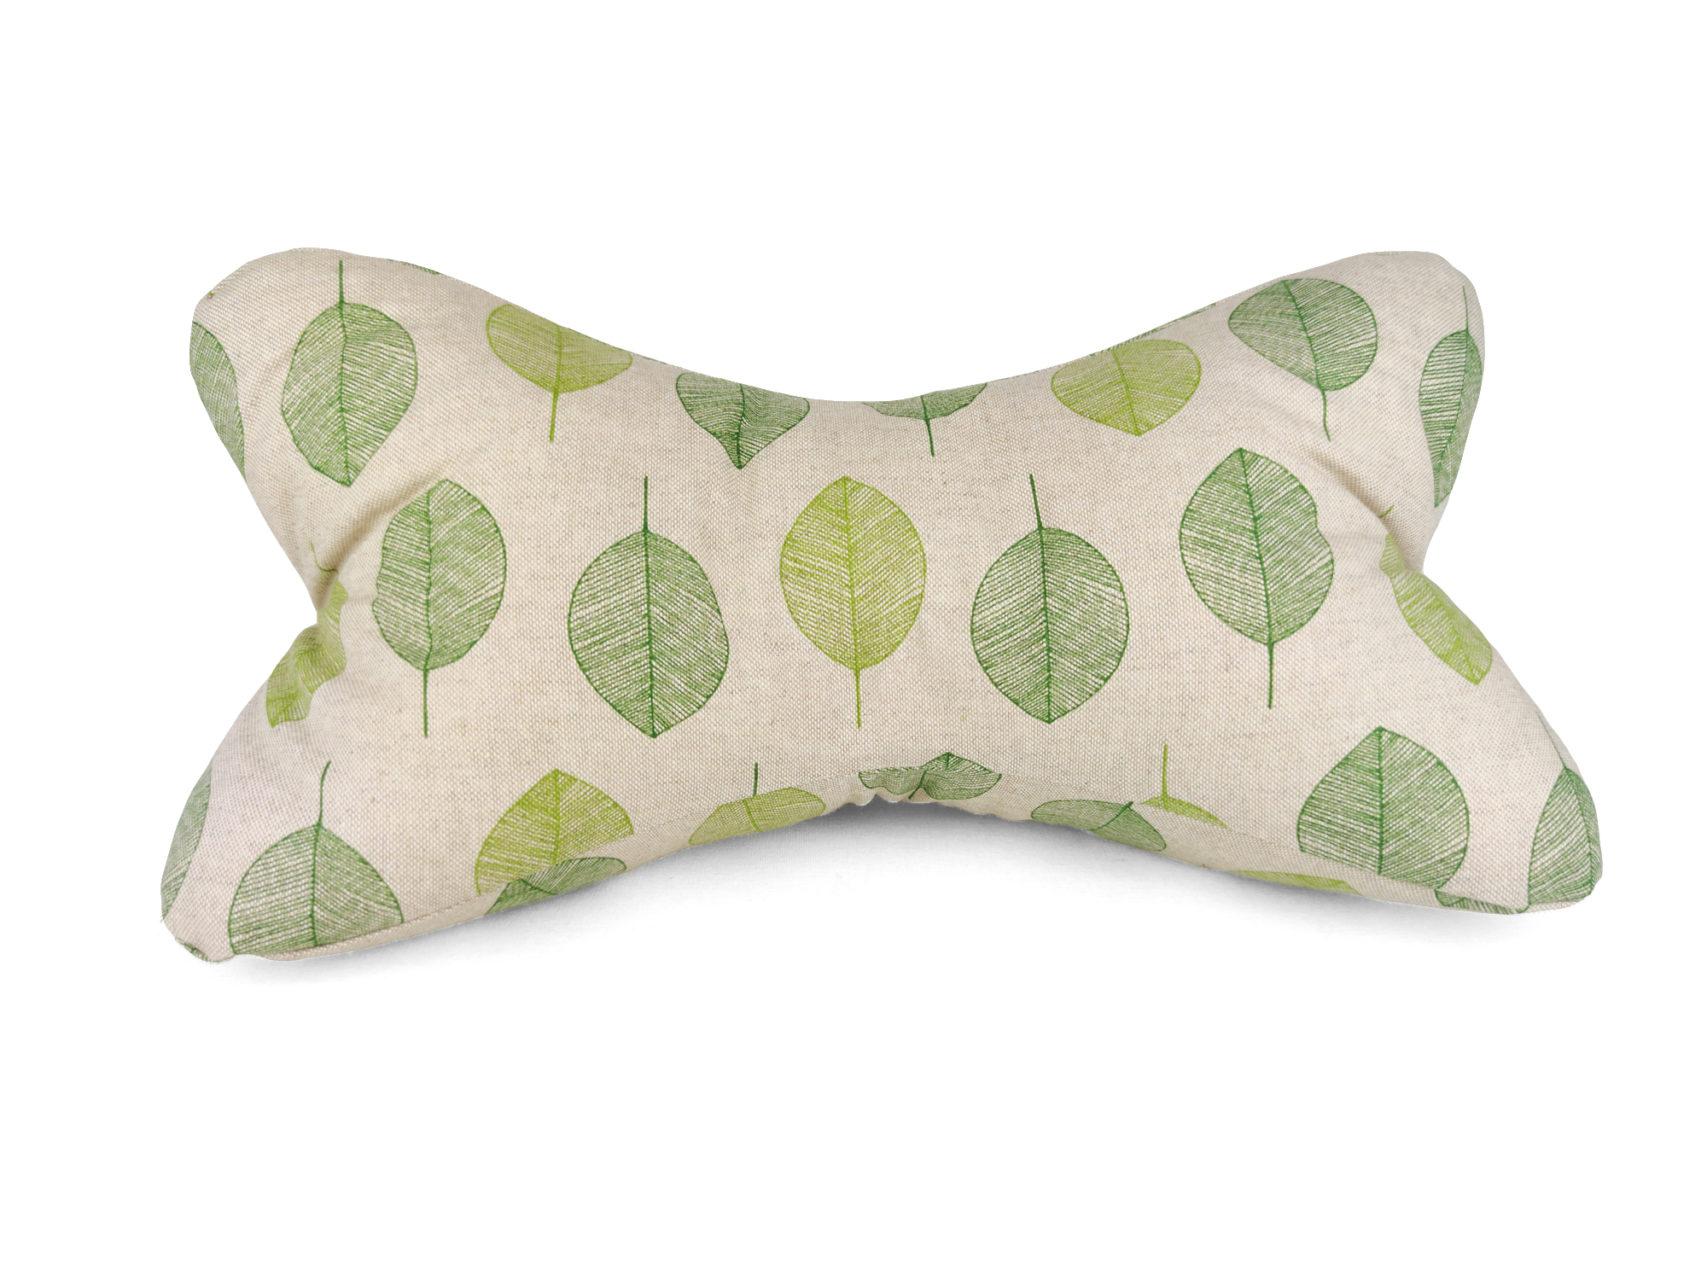 Leseknochen grüne Blätter Leinen Look